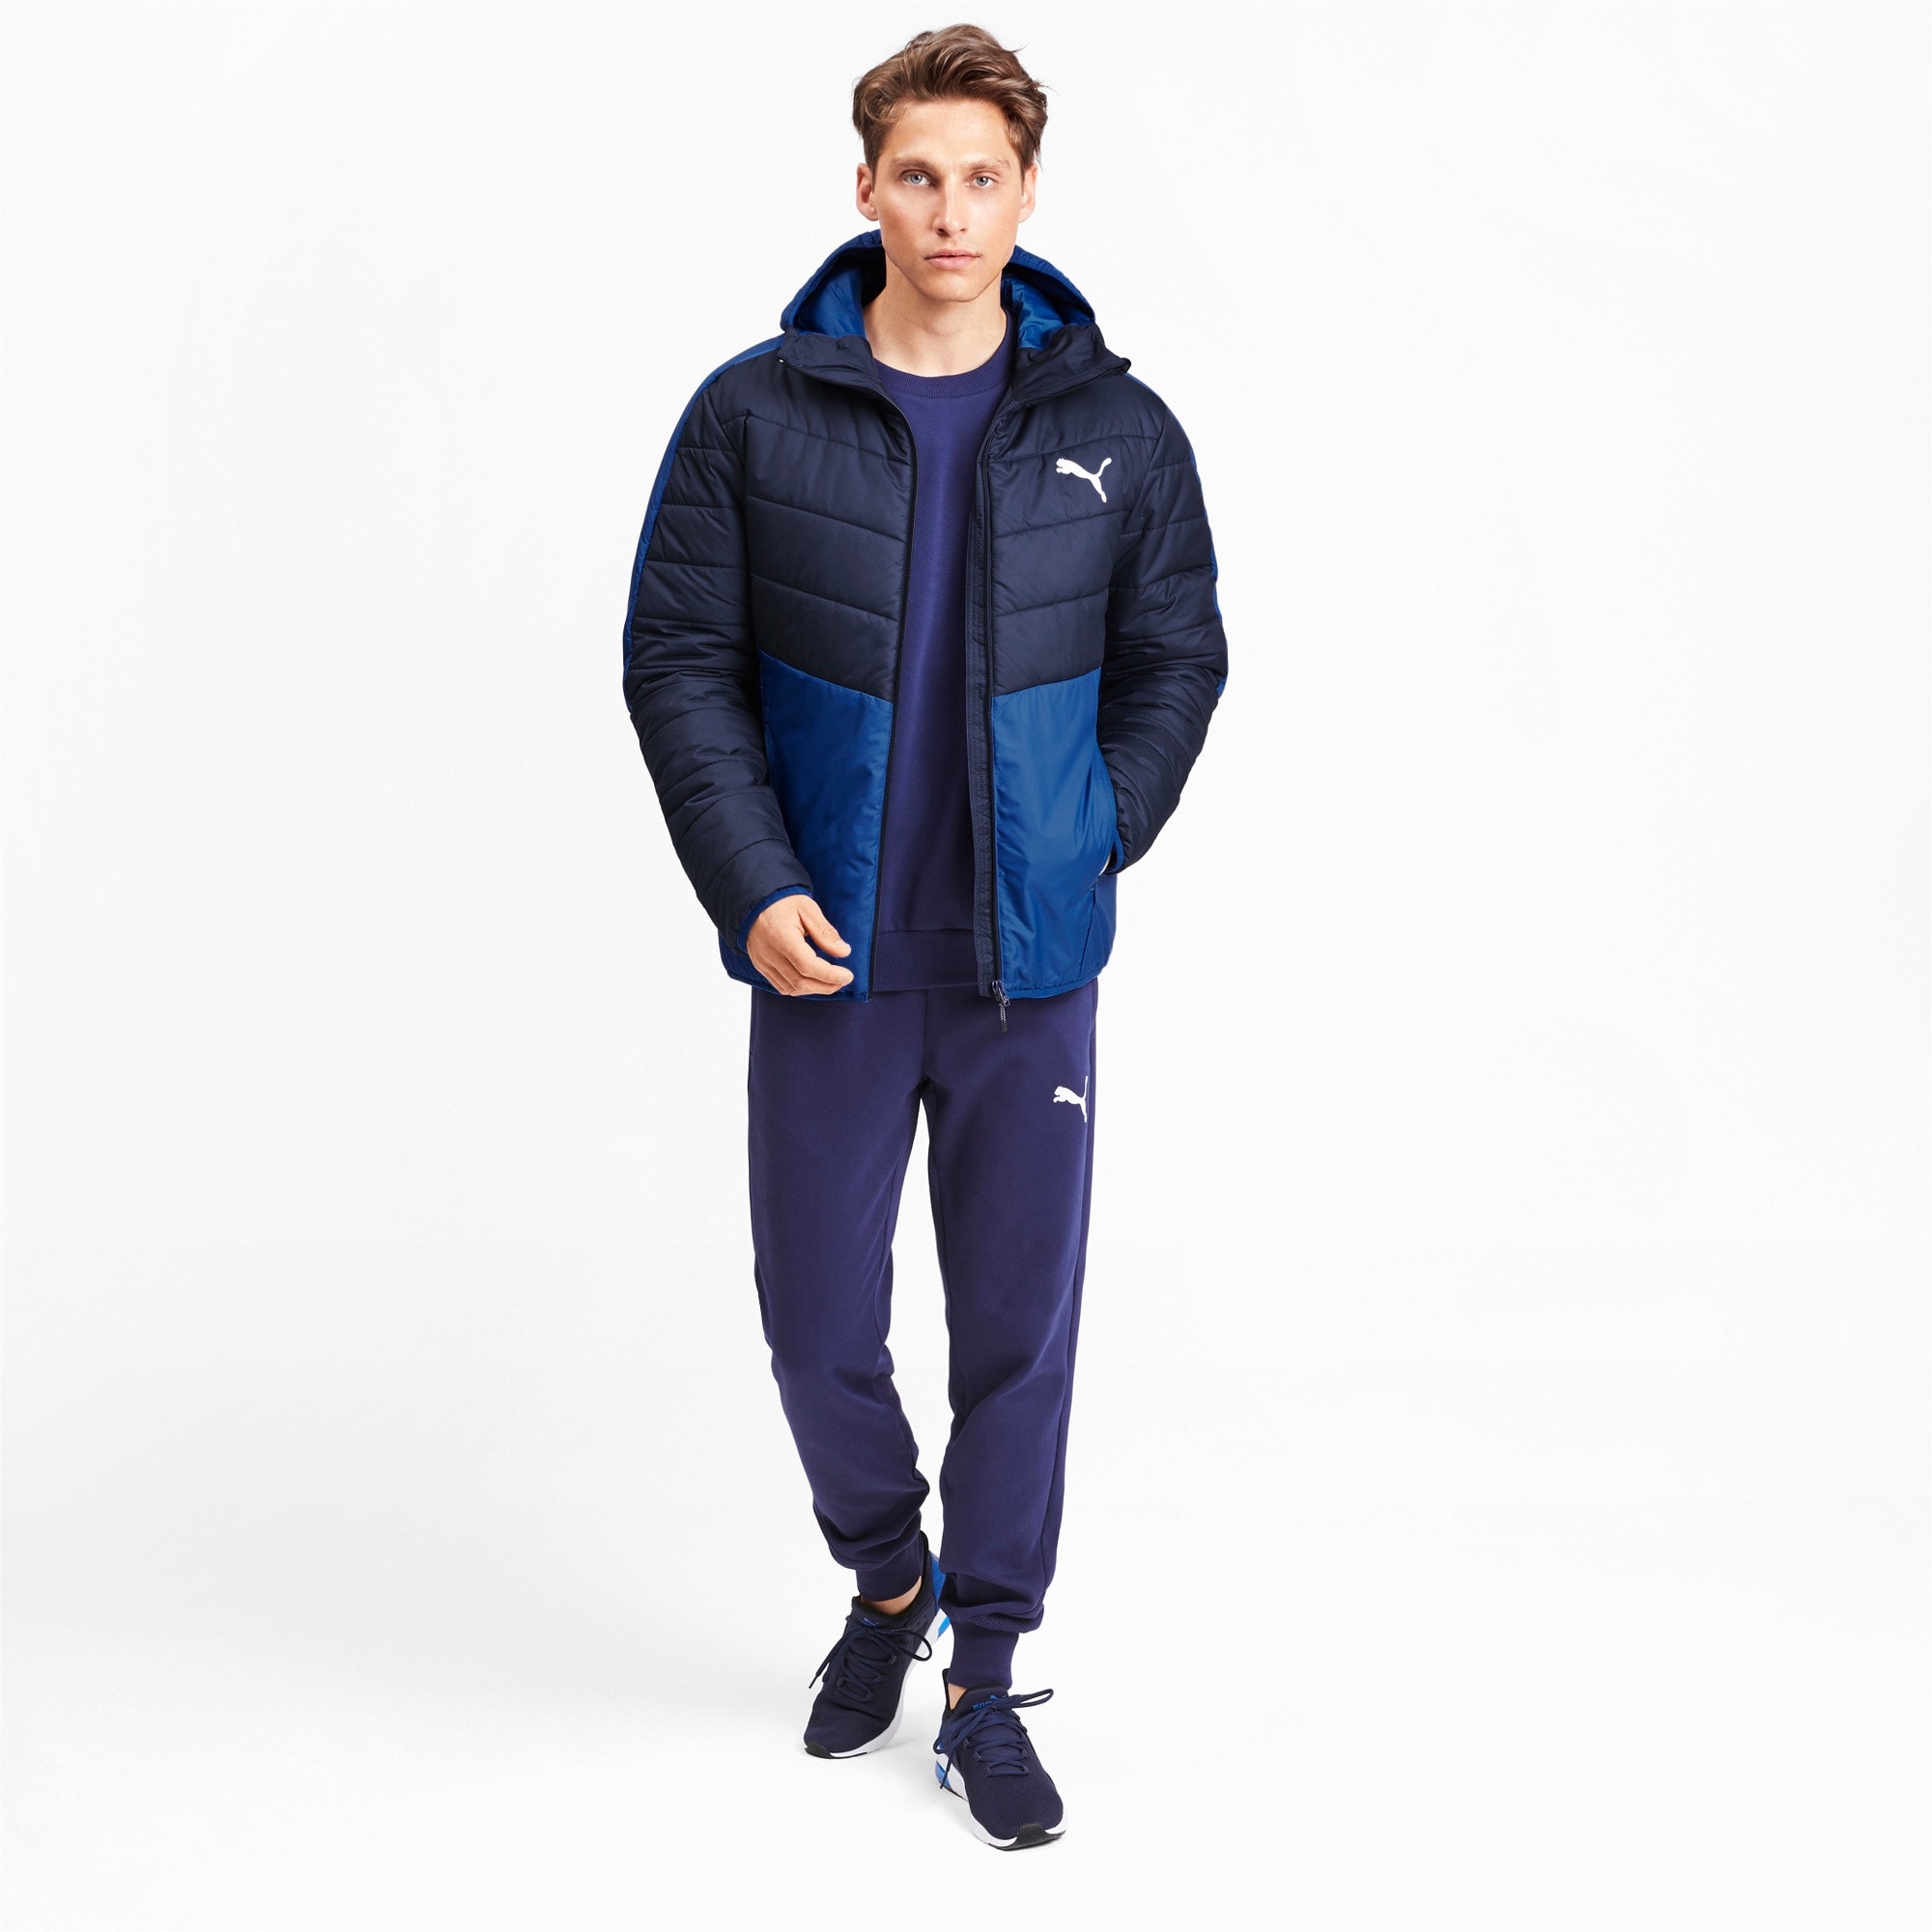 Thumbnail 4 of warmCELL Men's Padded Jacket, Galaxy Blue-Peacoat, medium